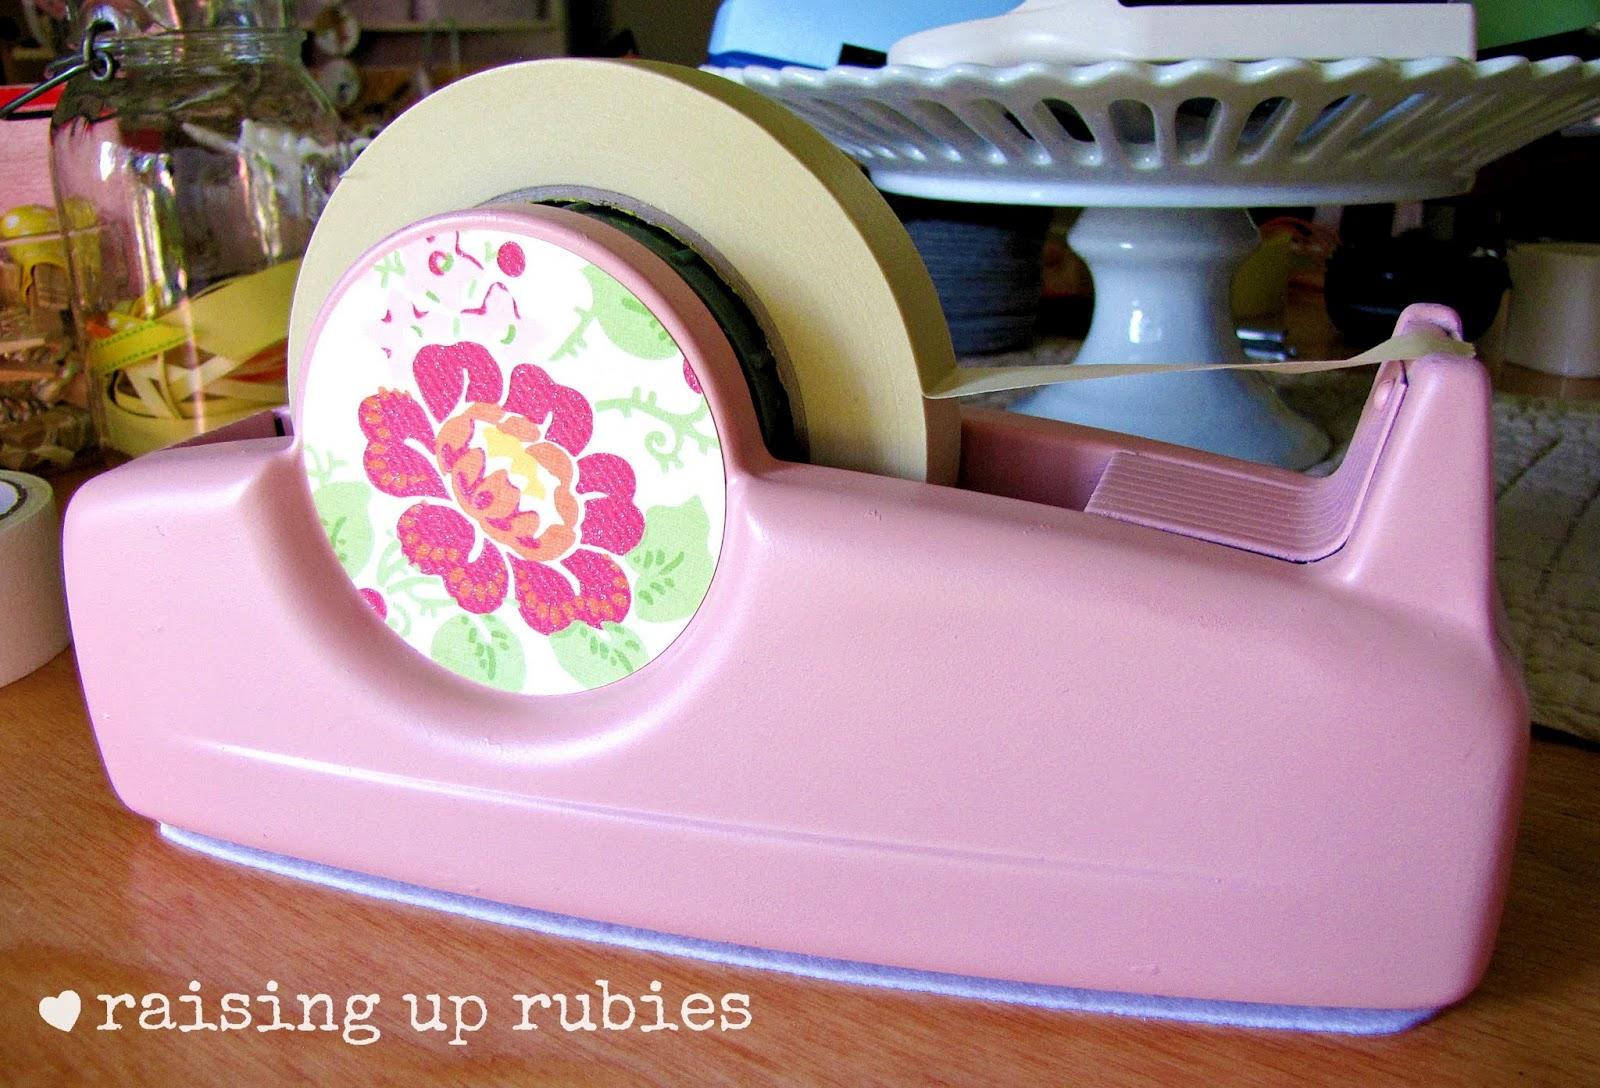 Raising Up Rubies Blog Trash To Treasure Decoupaged